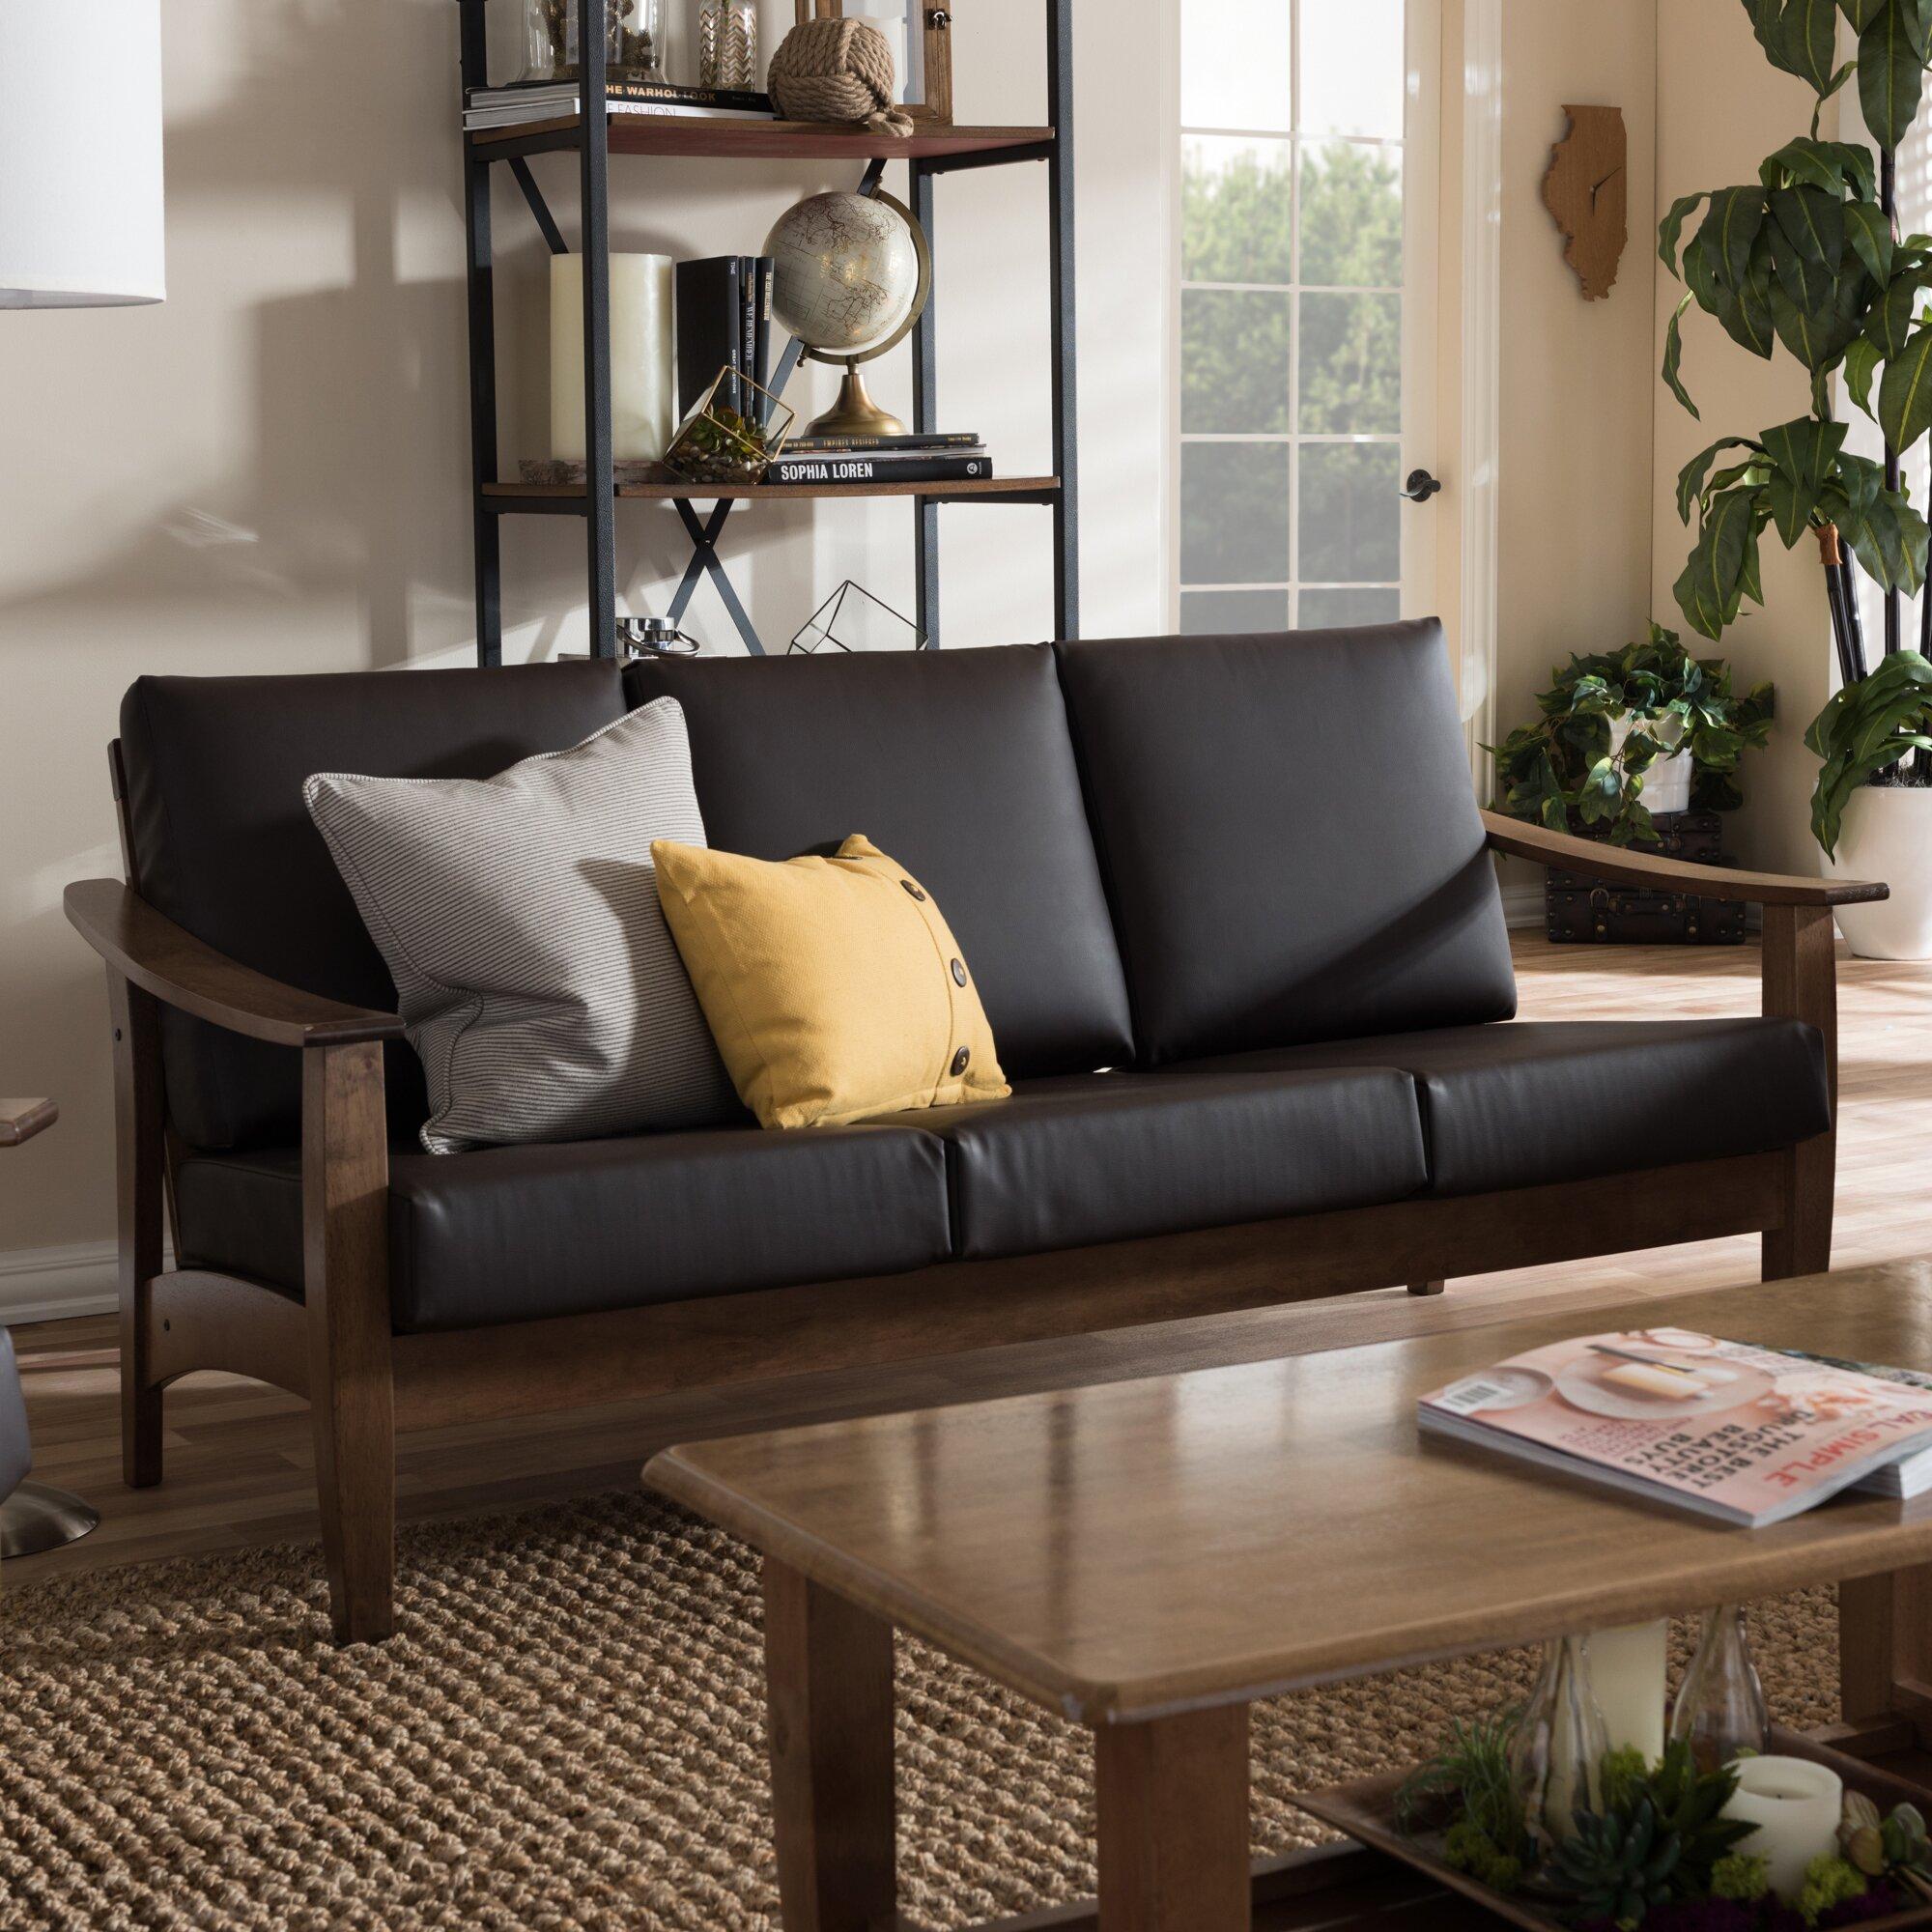 Baxton Studio Mid Century Masterpieces White Faux Leather: Wholesale Interiors Baxton Studio 3 Seater Sofa & Reviews